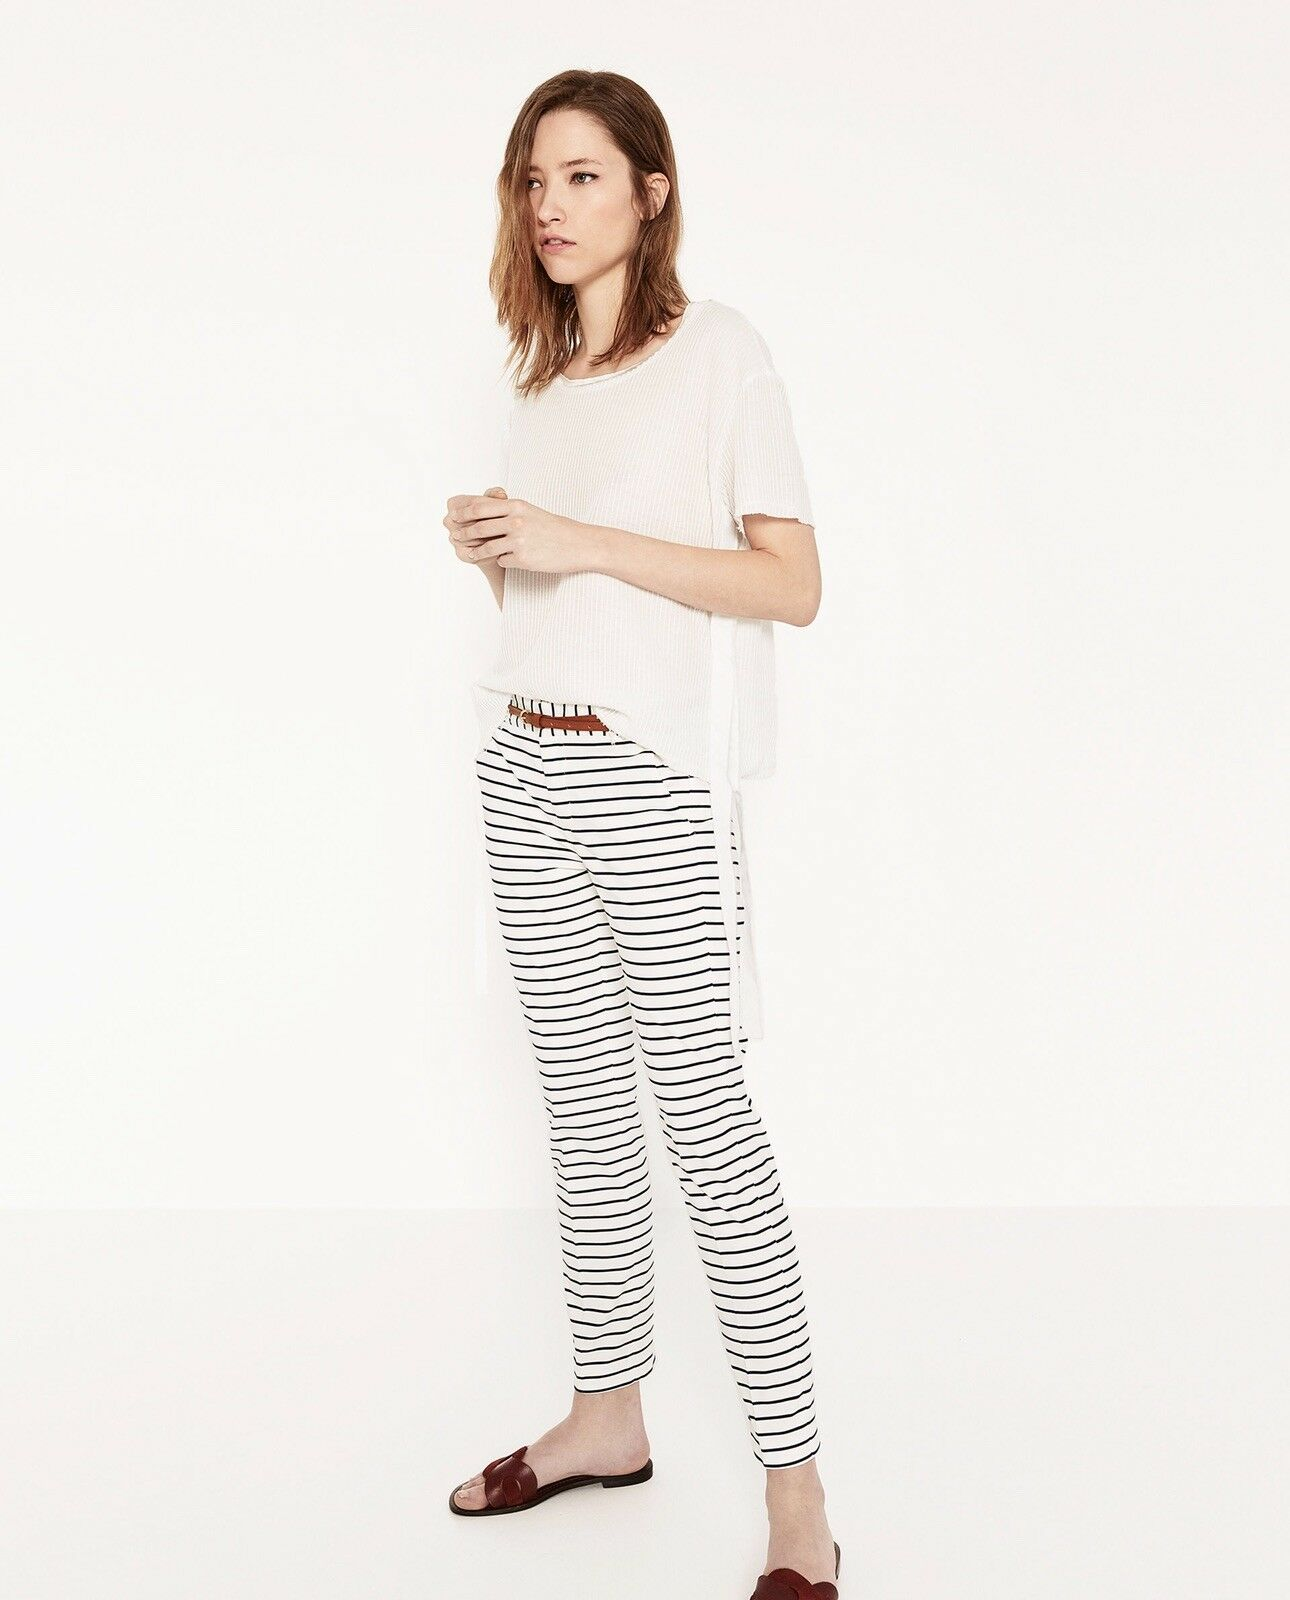 Zara Women Striped Trousers With Belt White Navy Size 2 NWT